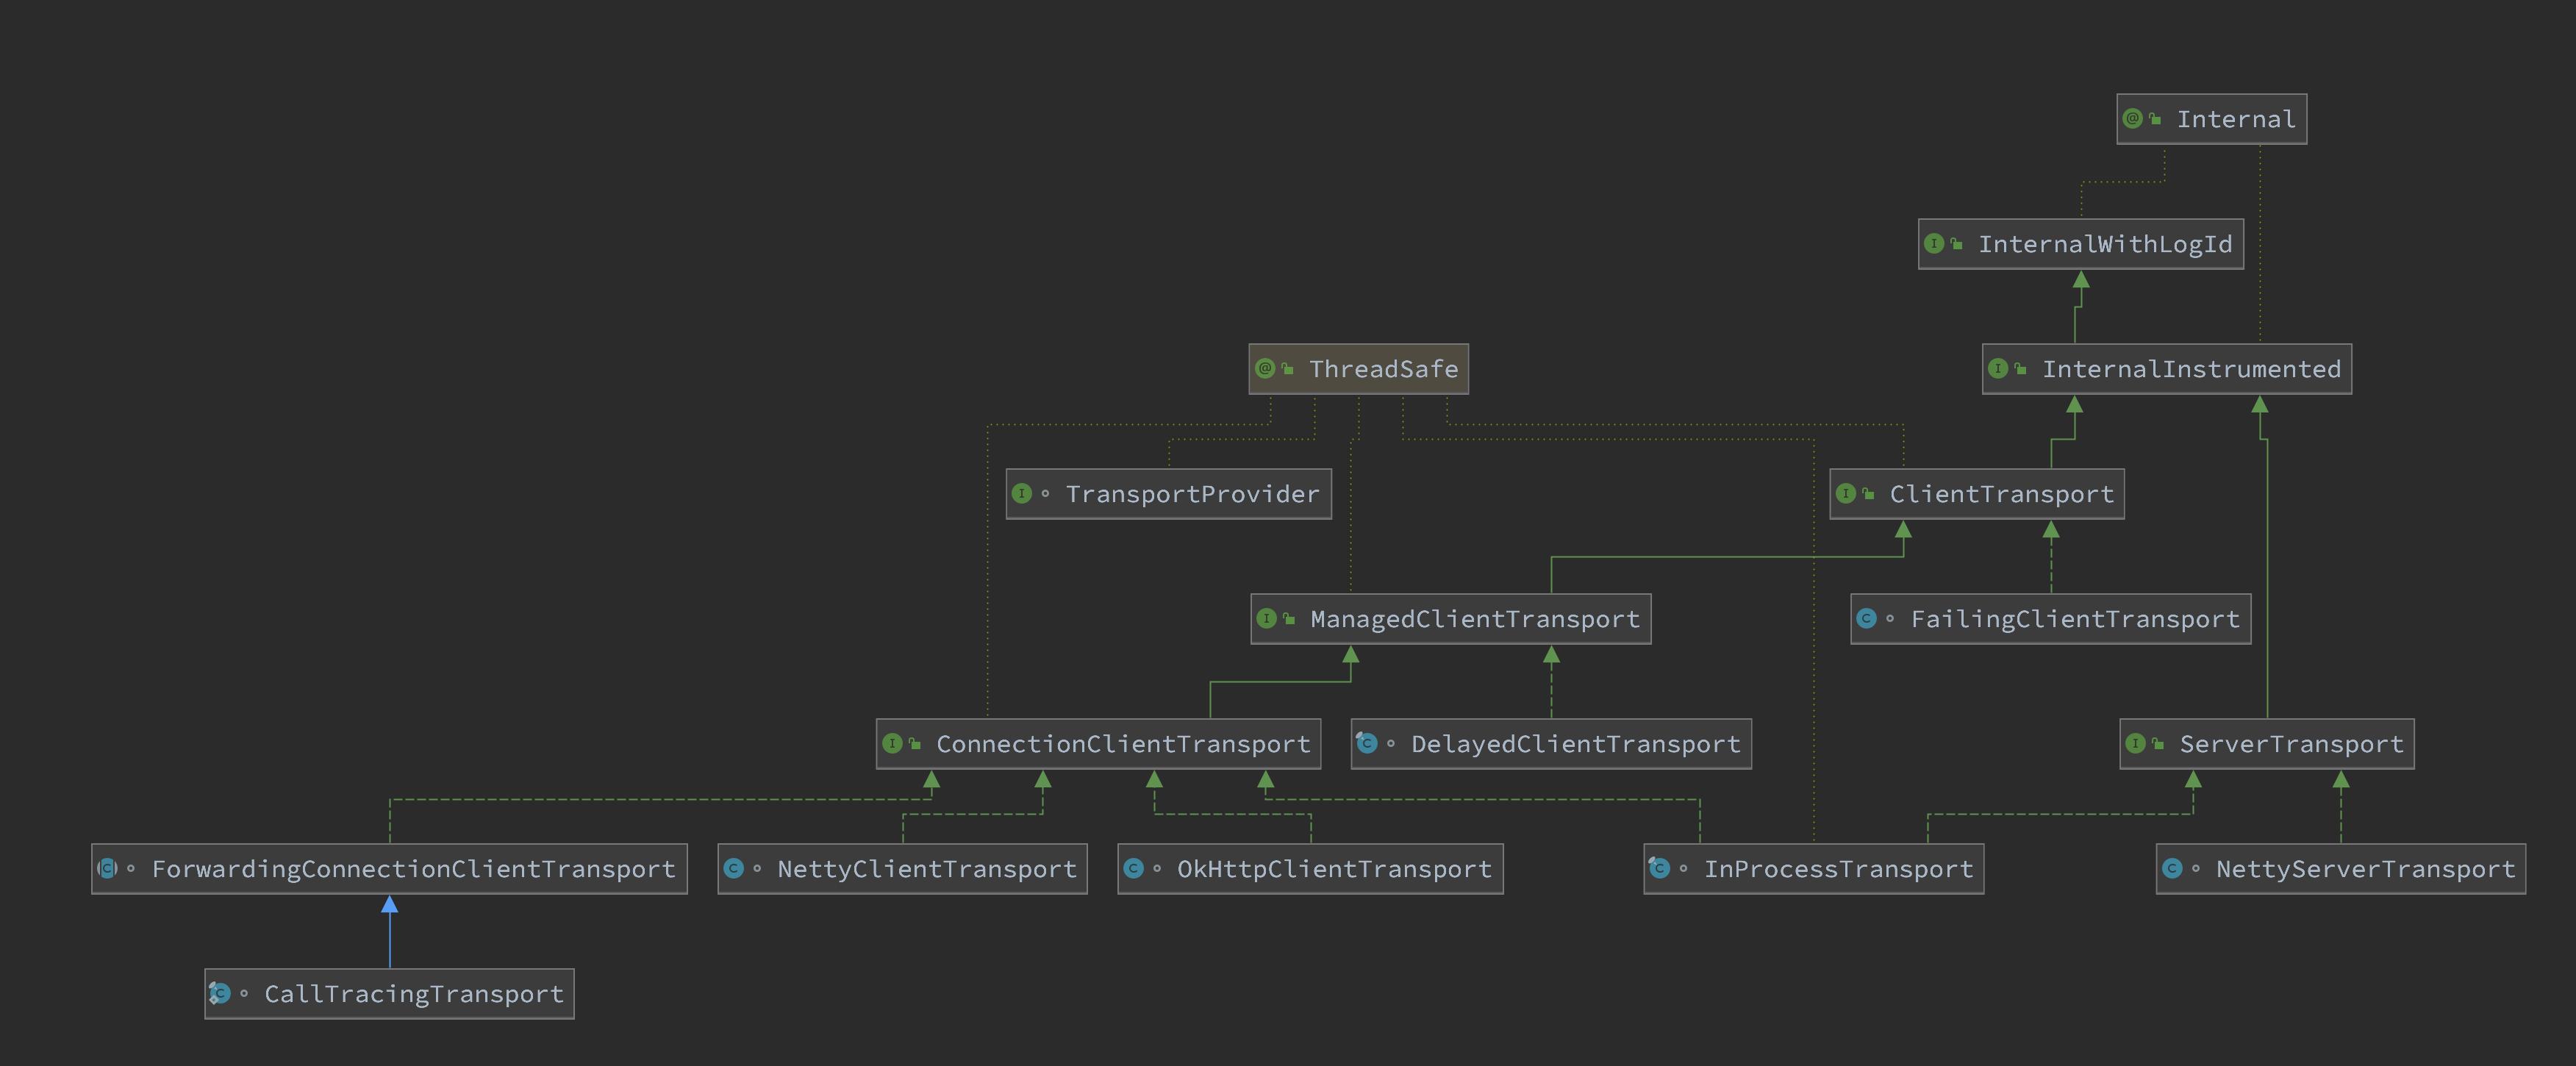 grpc-source-code-transport-classes-diagram.png